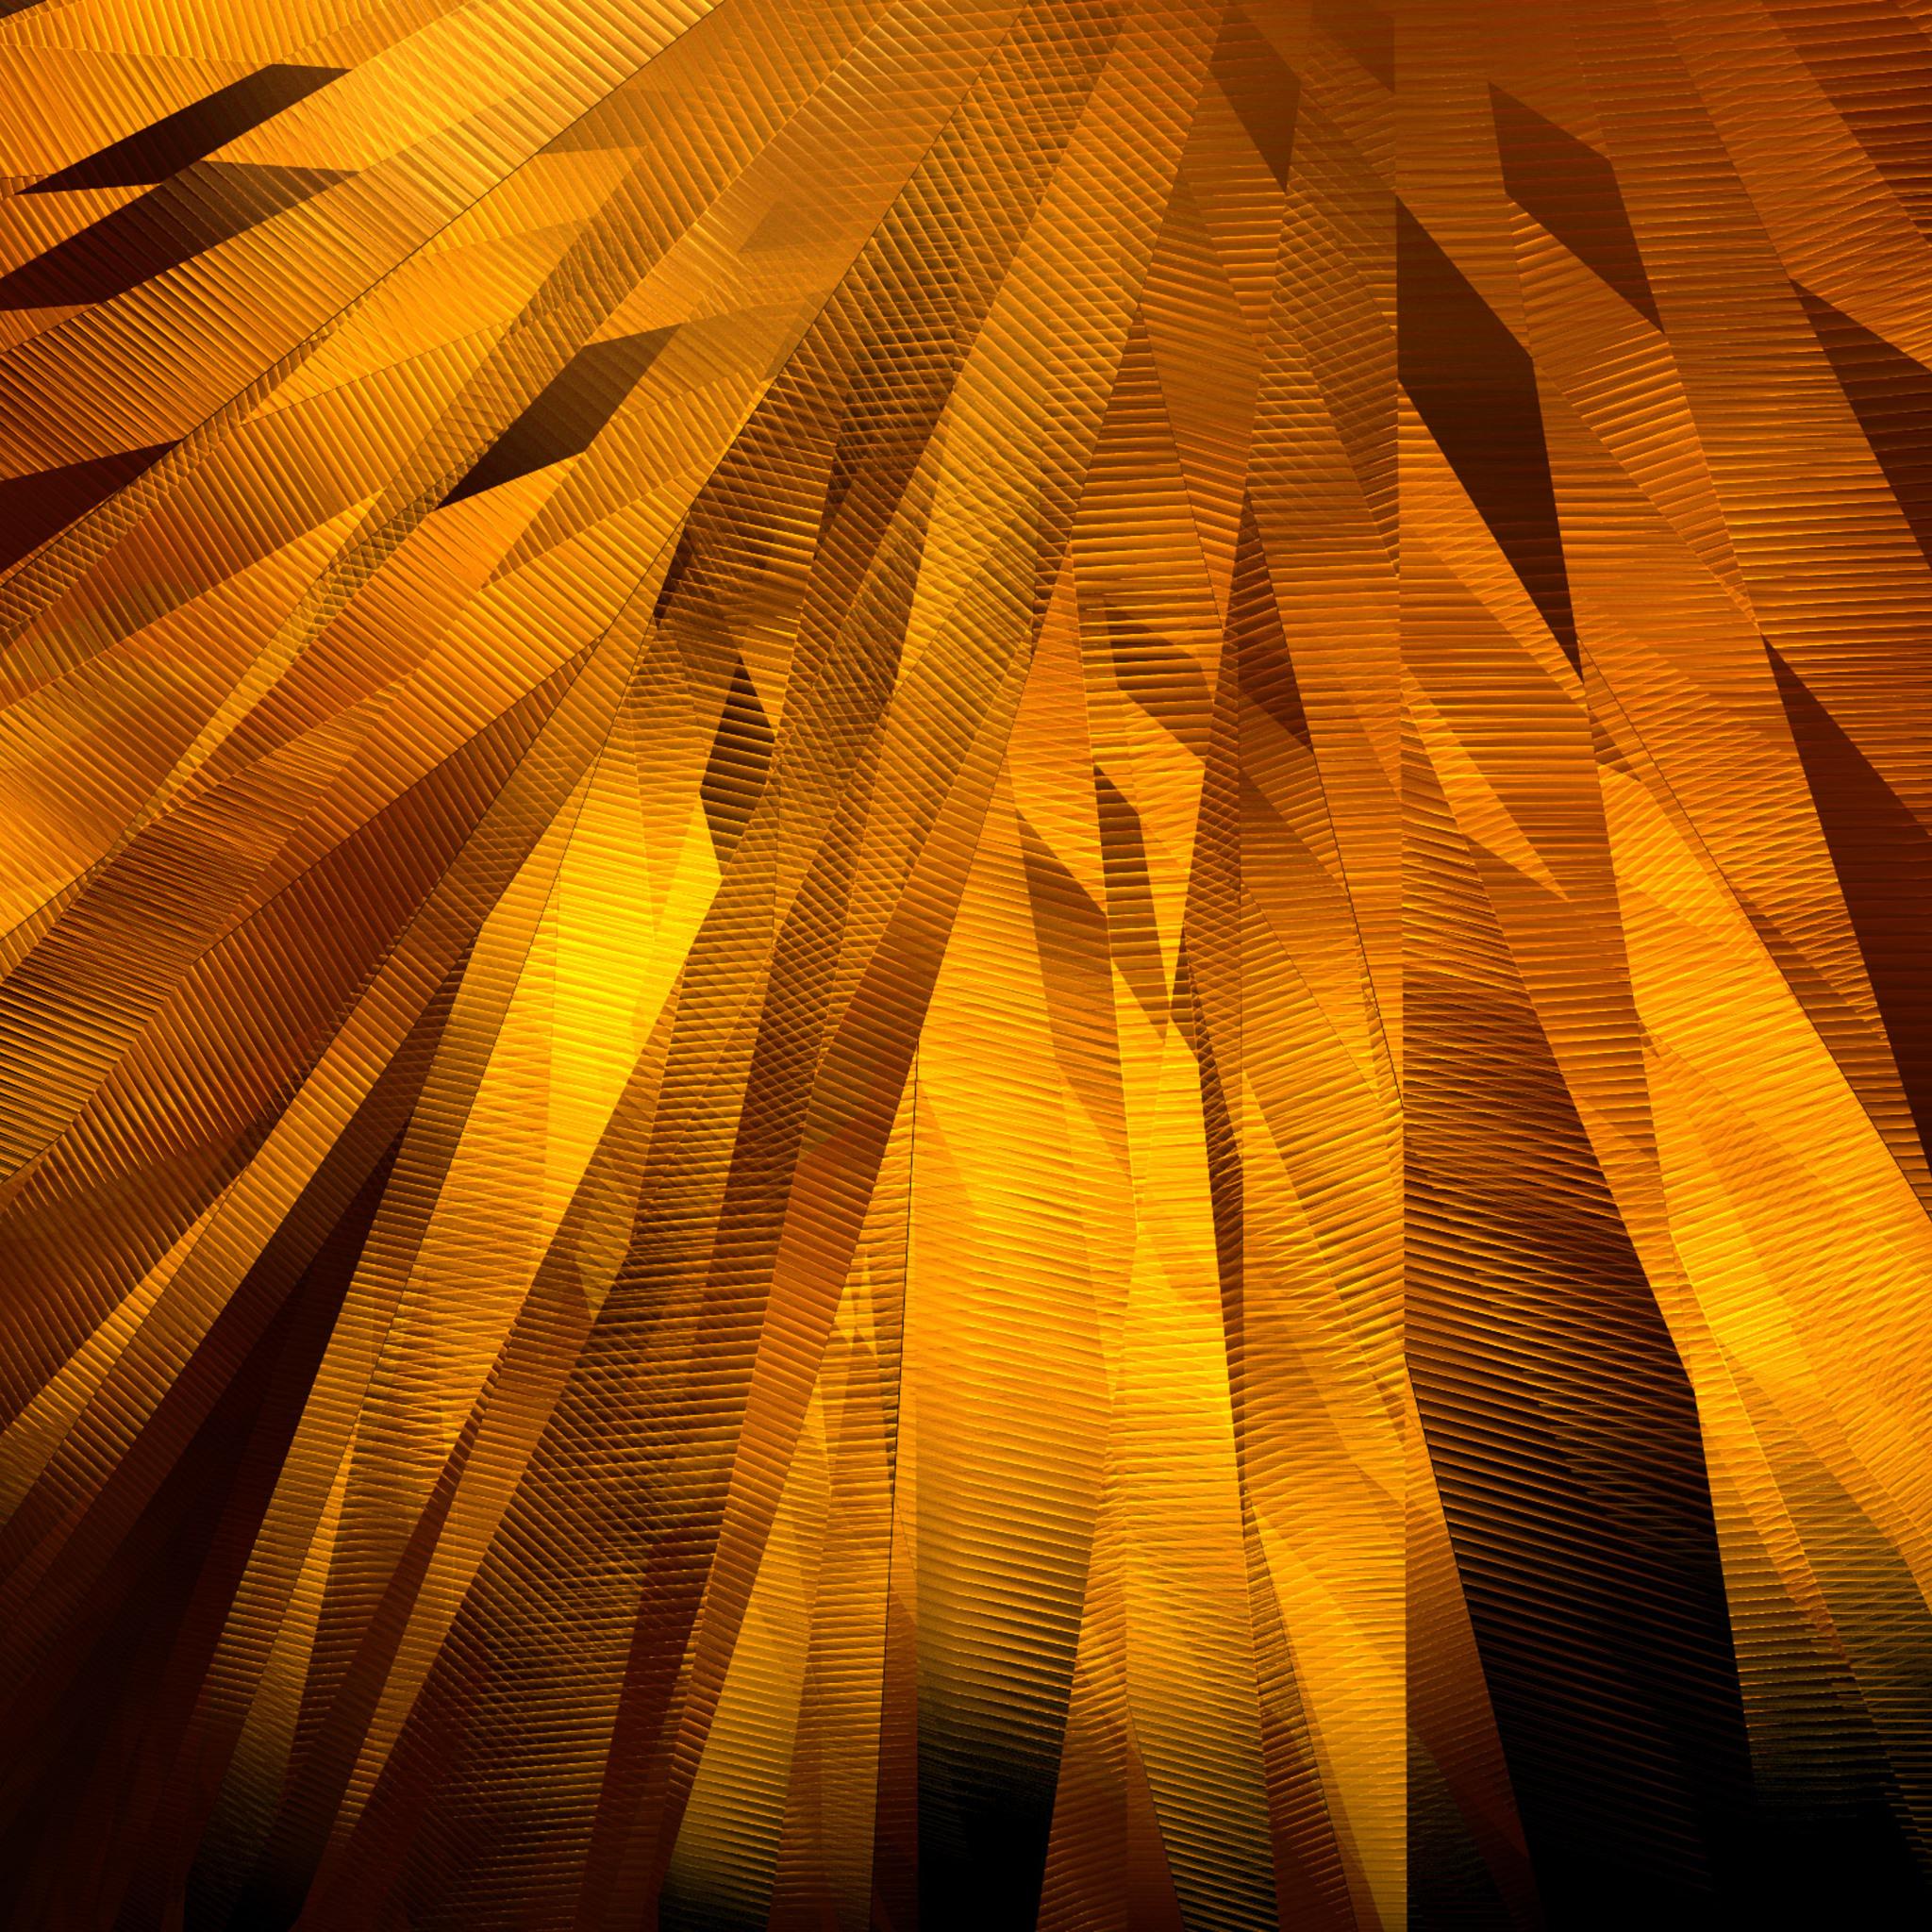 2048x2048 Abstract Golden Belts Ipad Air HD 4k Wallpapers